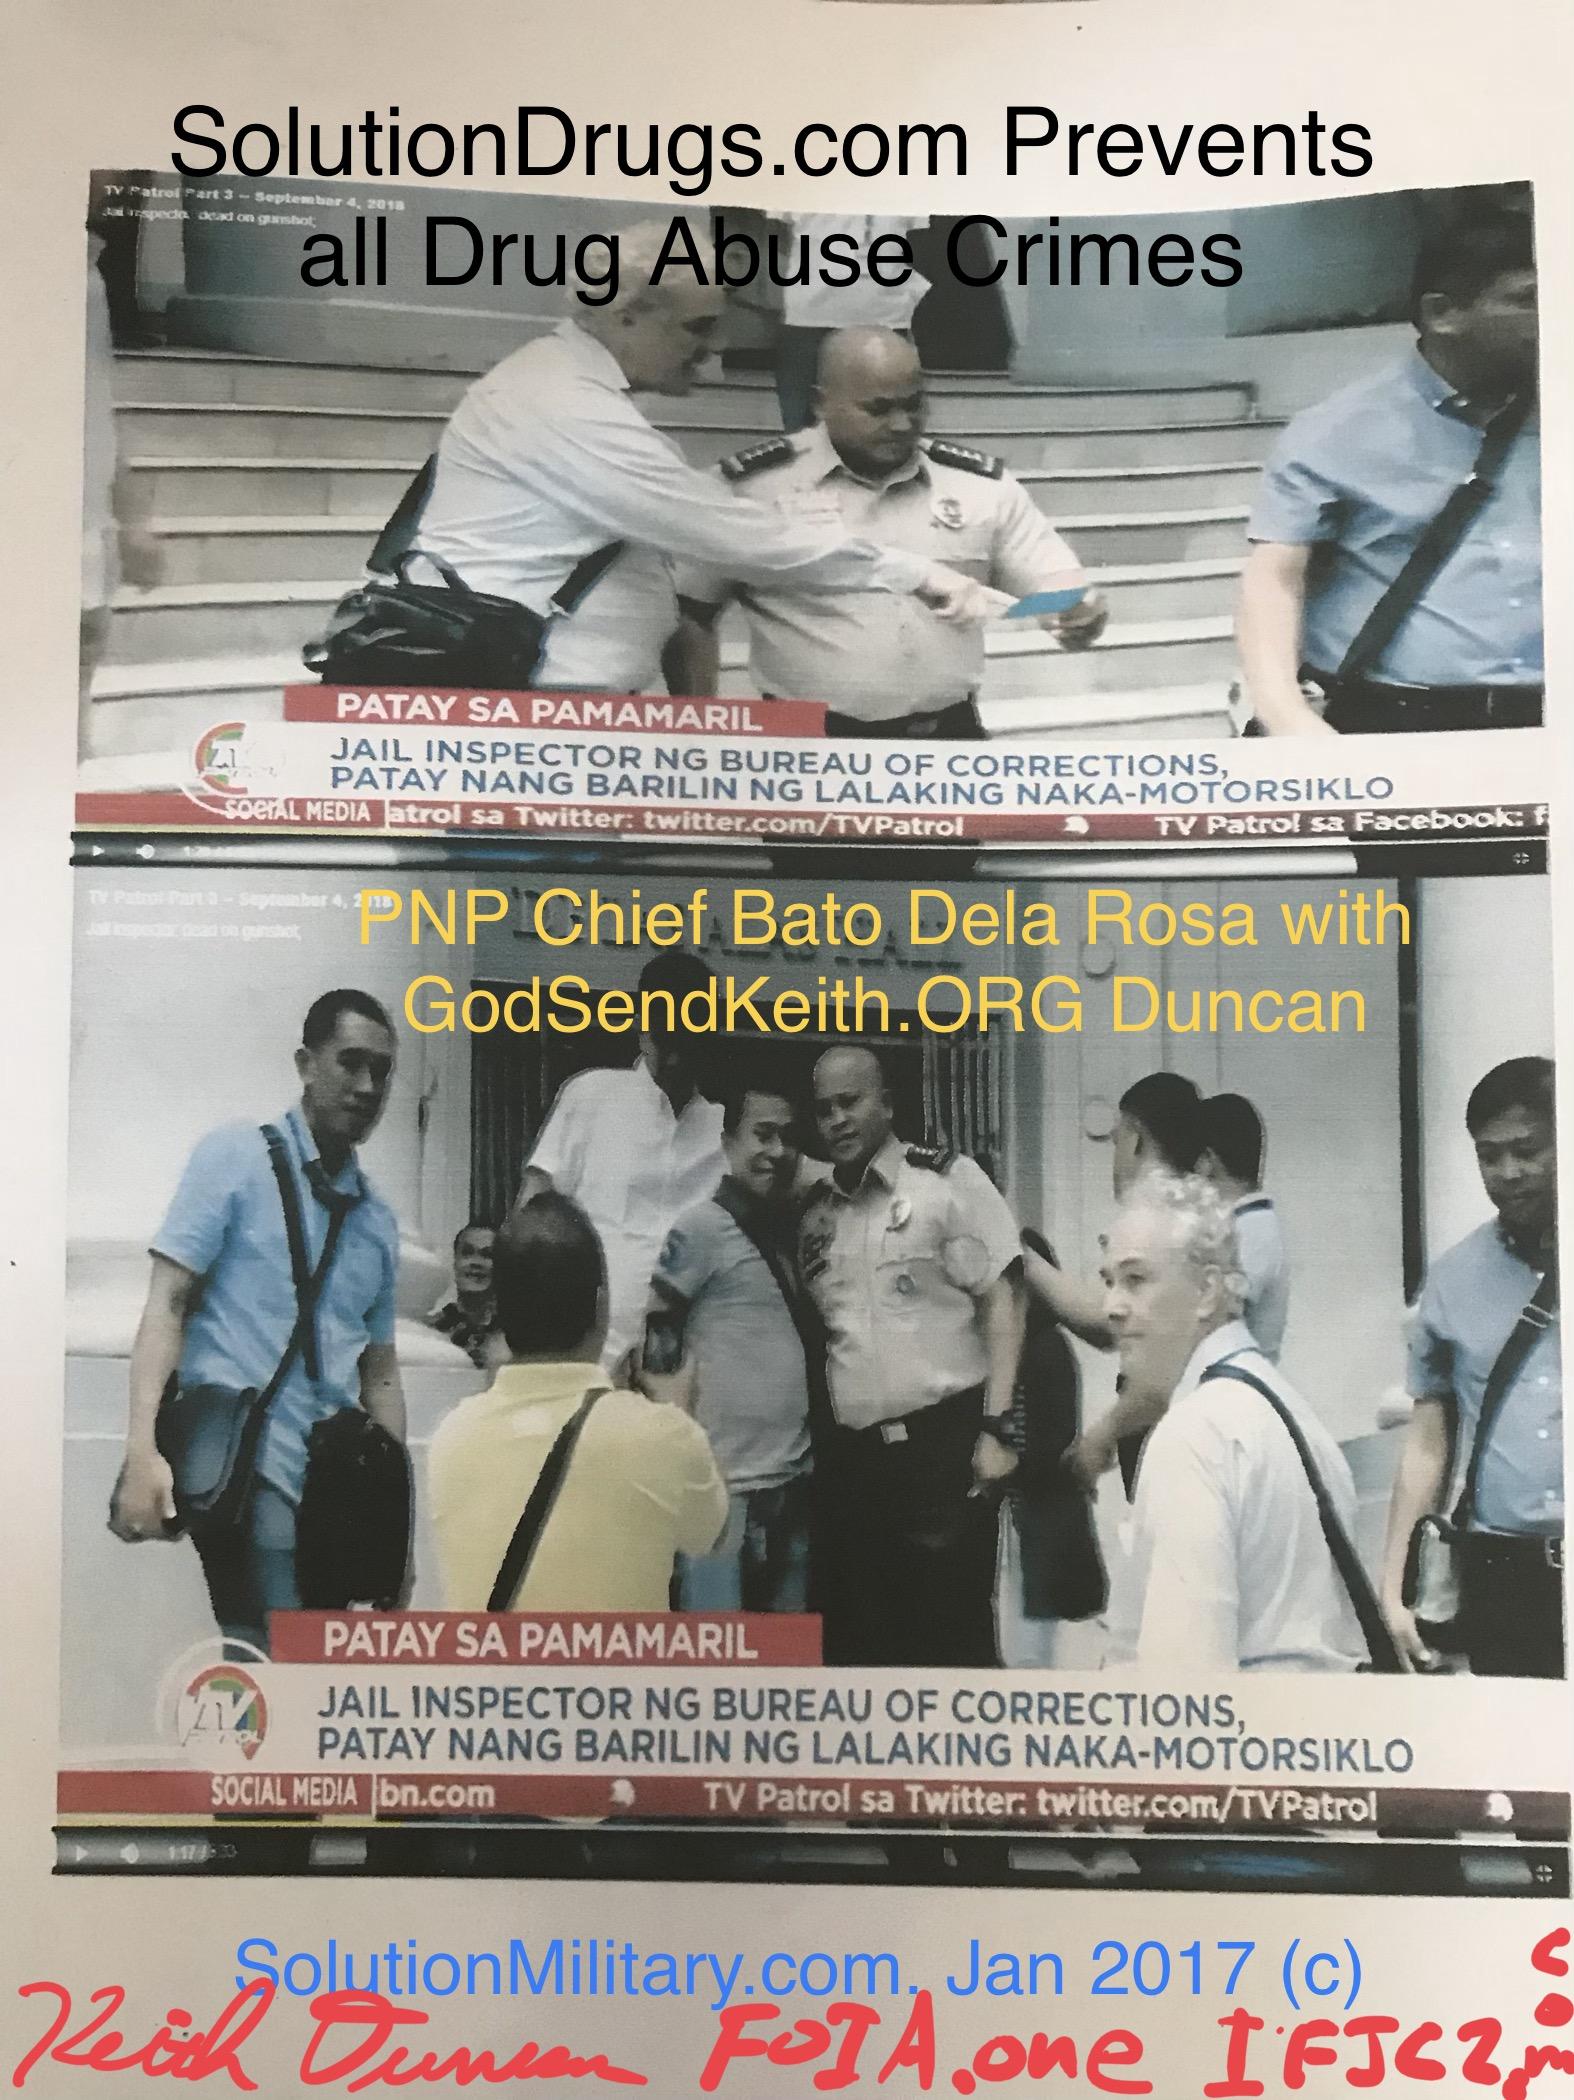 BBK20180913-SolutionDrugs-ChiefPNP-BataD